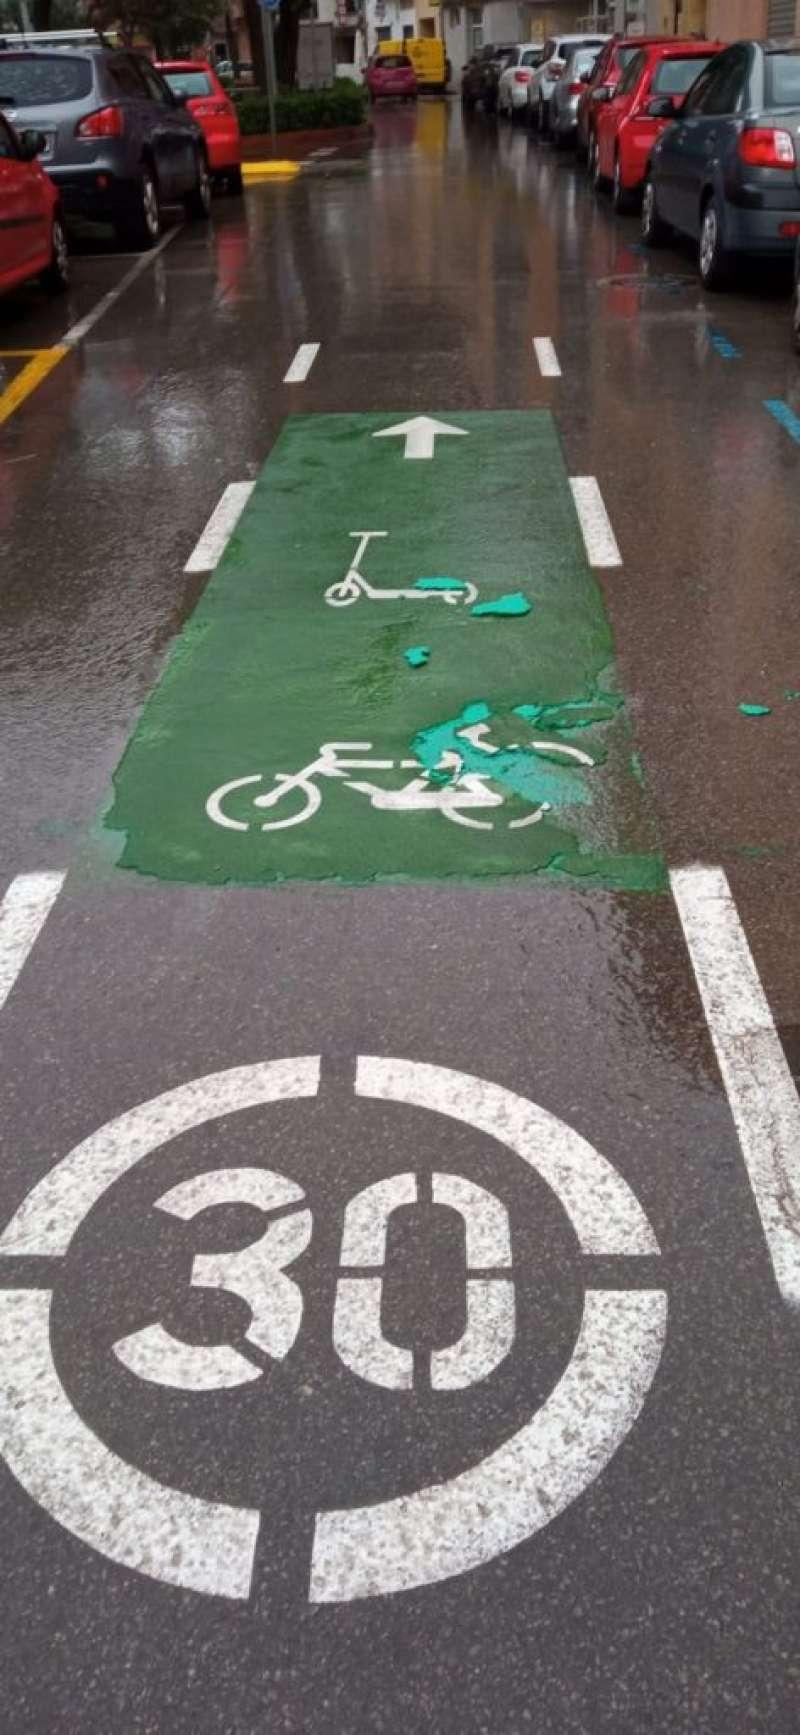 Detalle carril bici